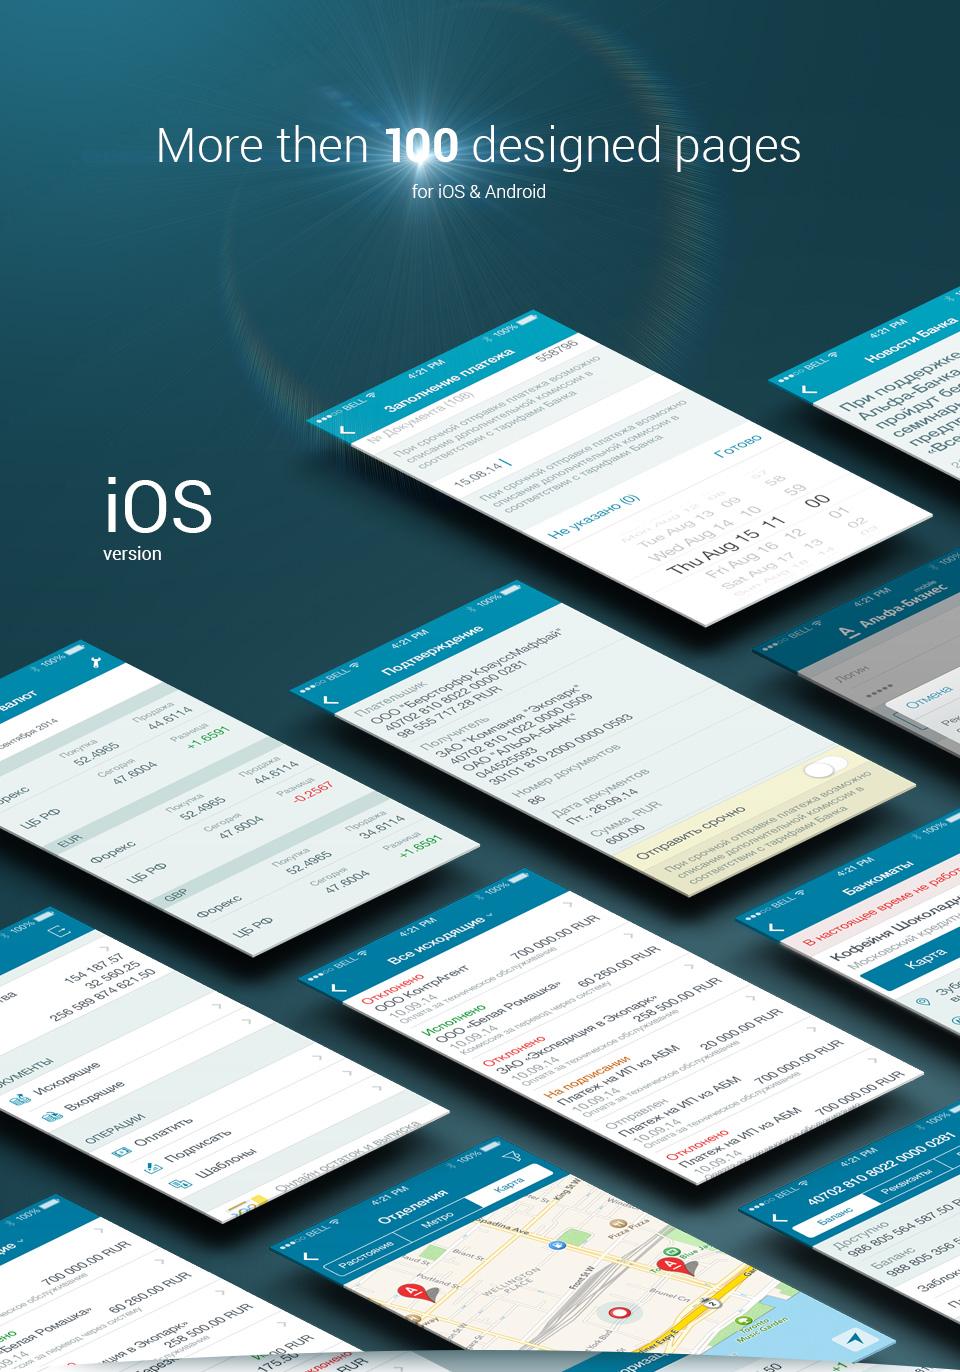 Альфа-Бизнес, приложение android и iOS